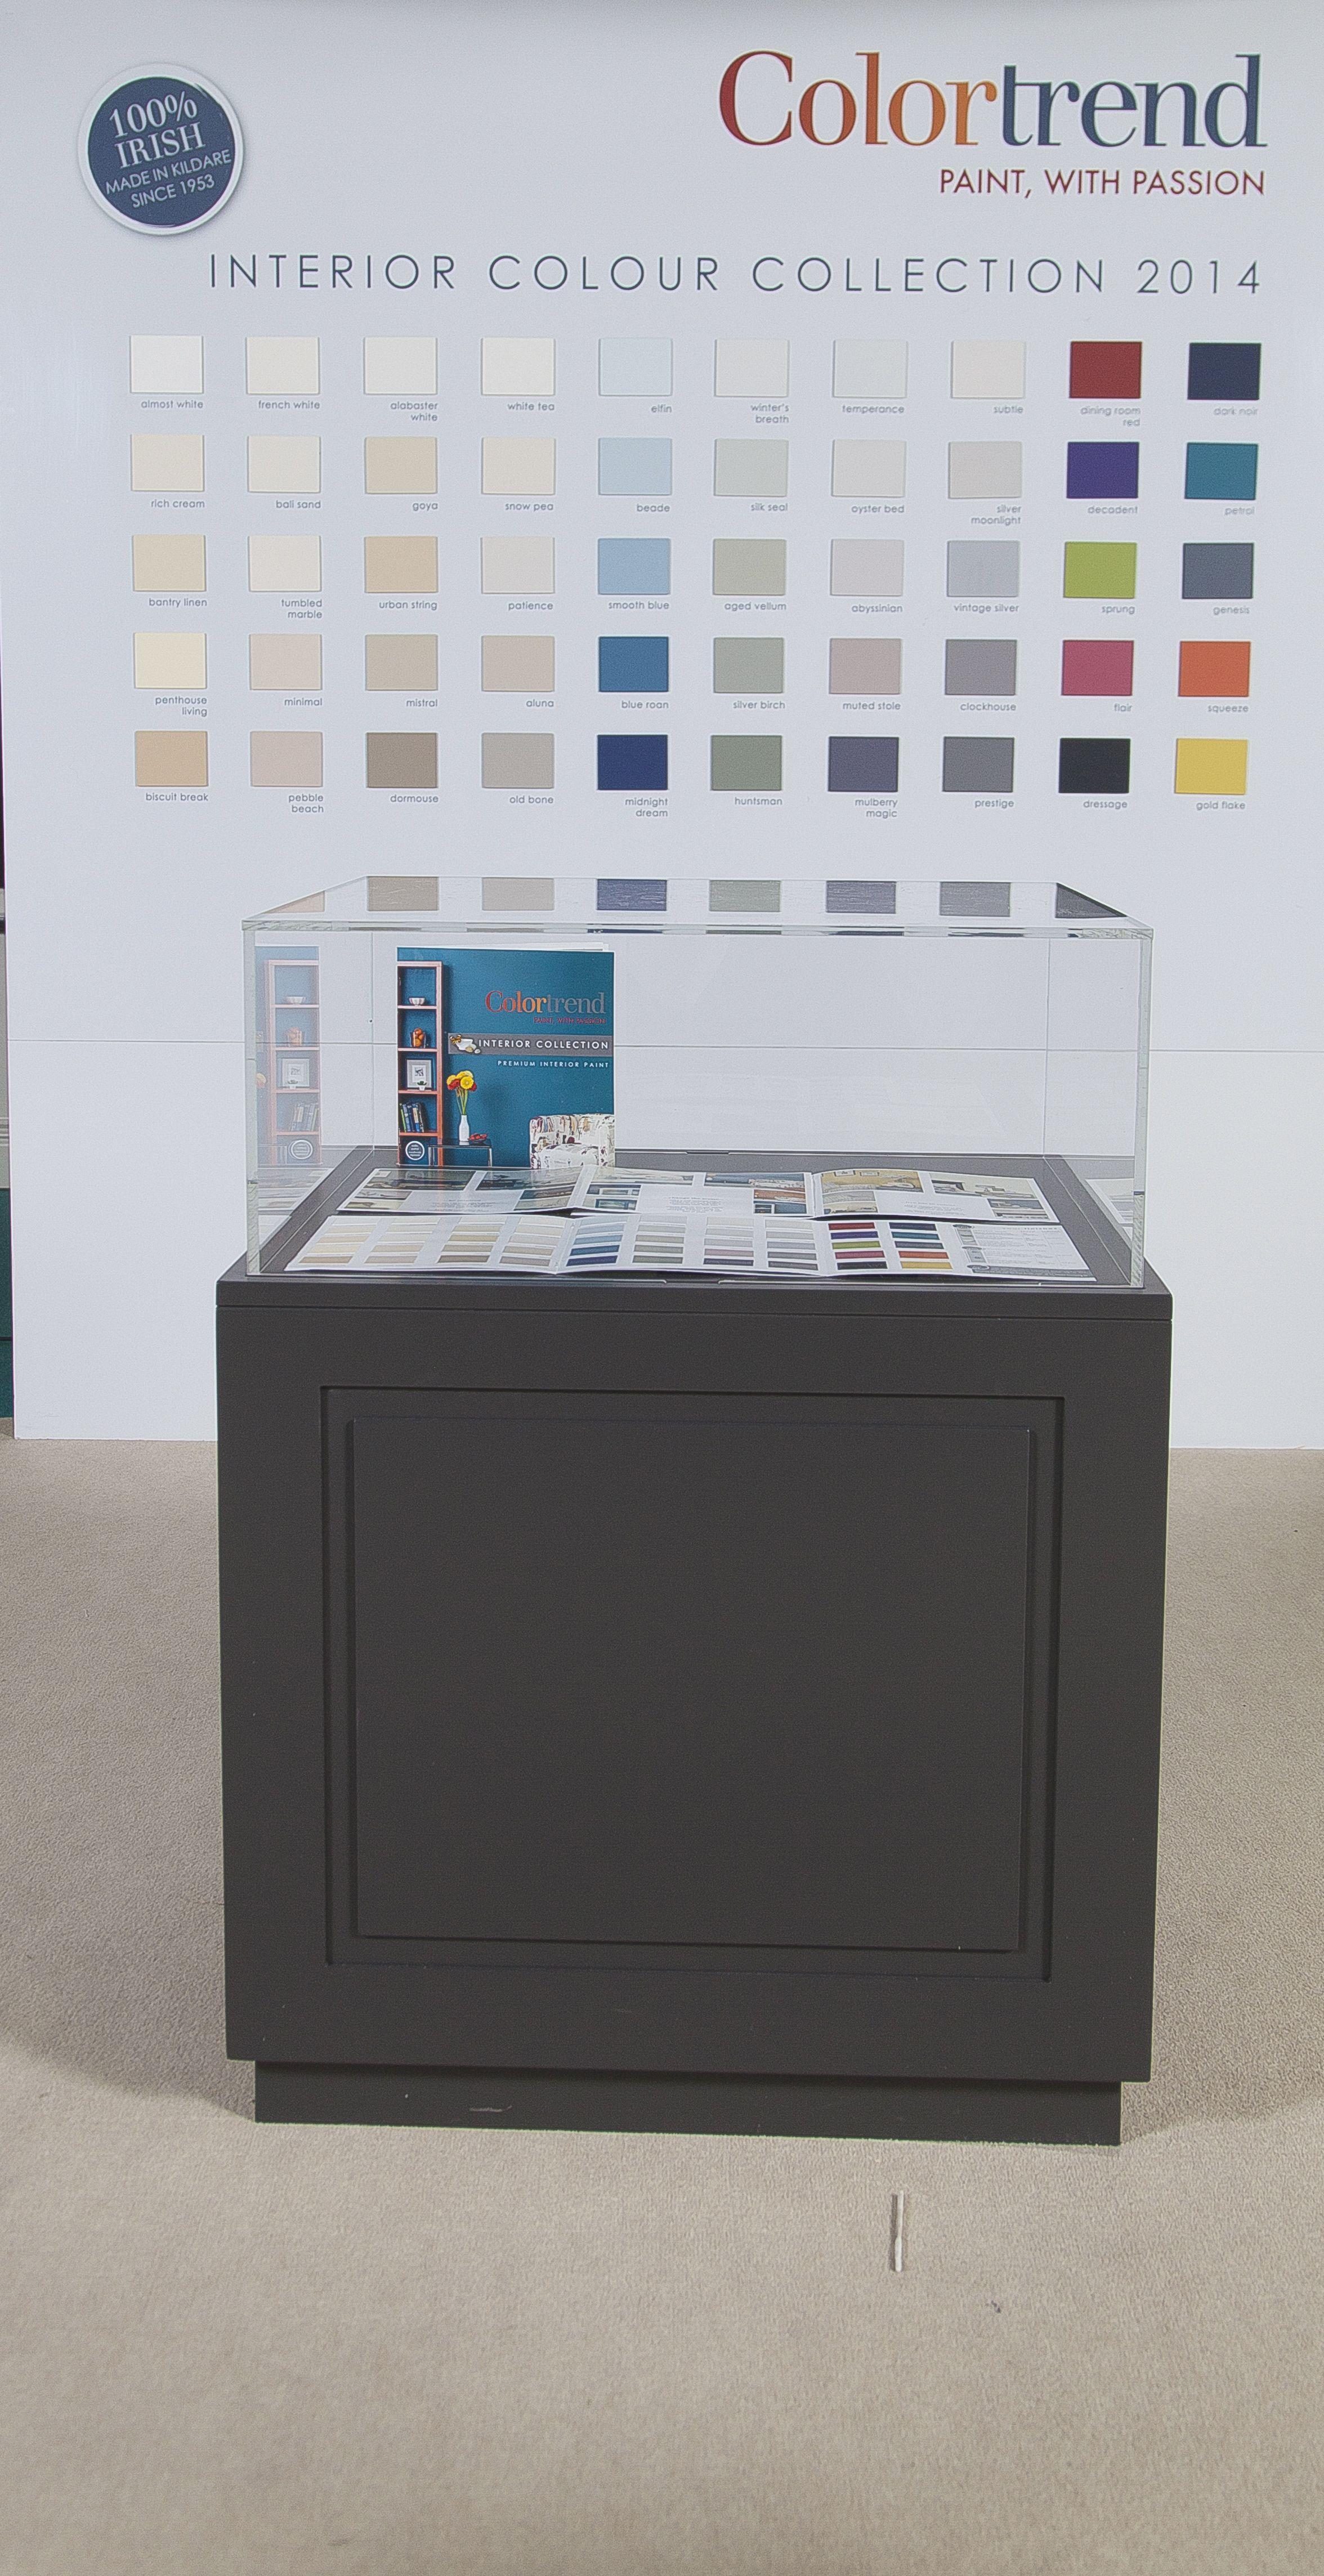 The Colortrend Interior Design Forum   2014 Colour Palette U0026 Card Unveiled!